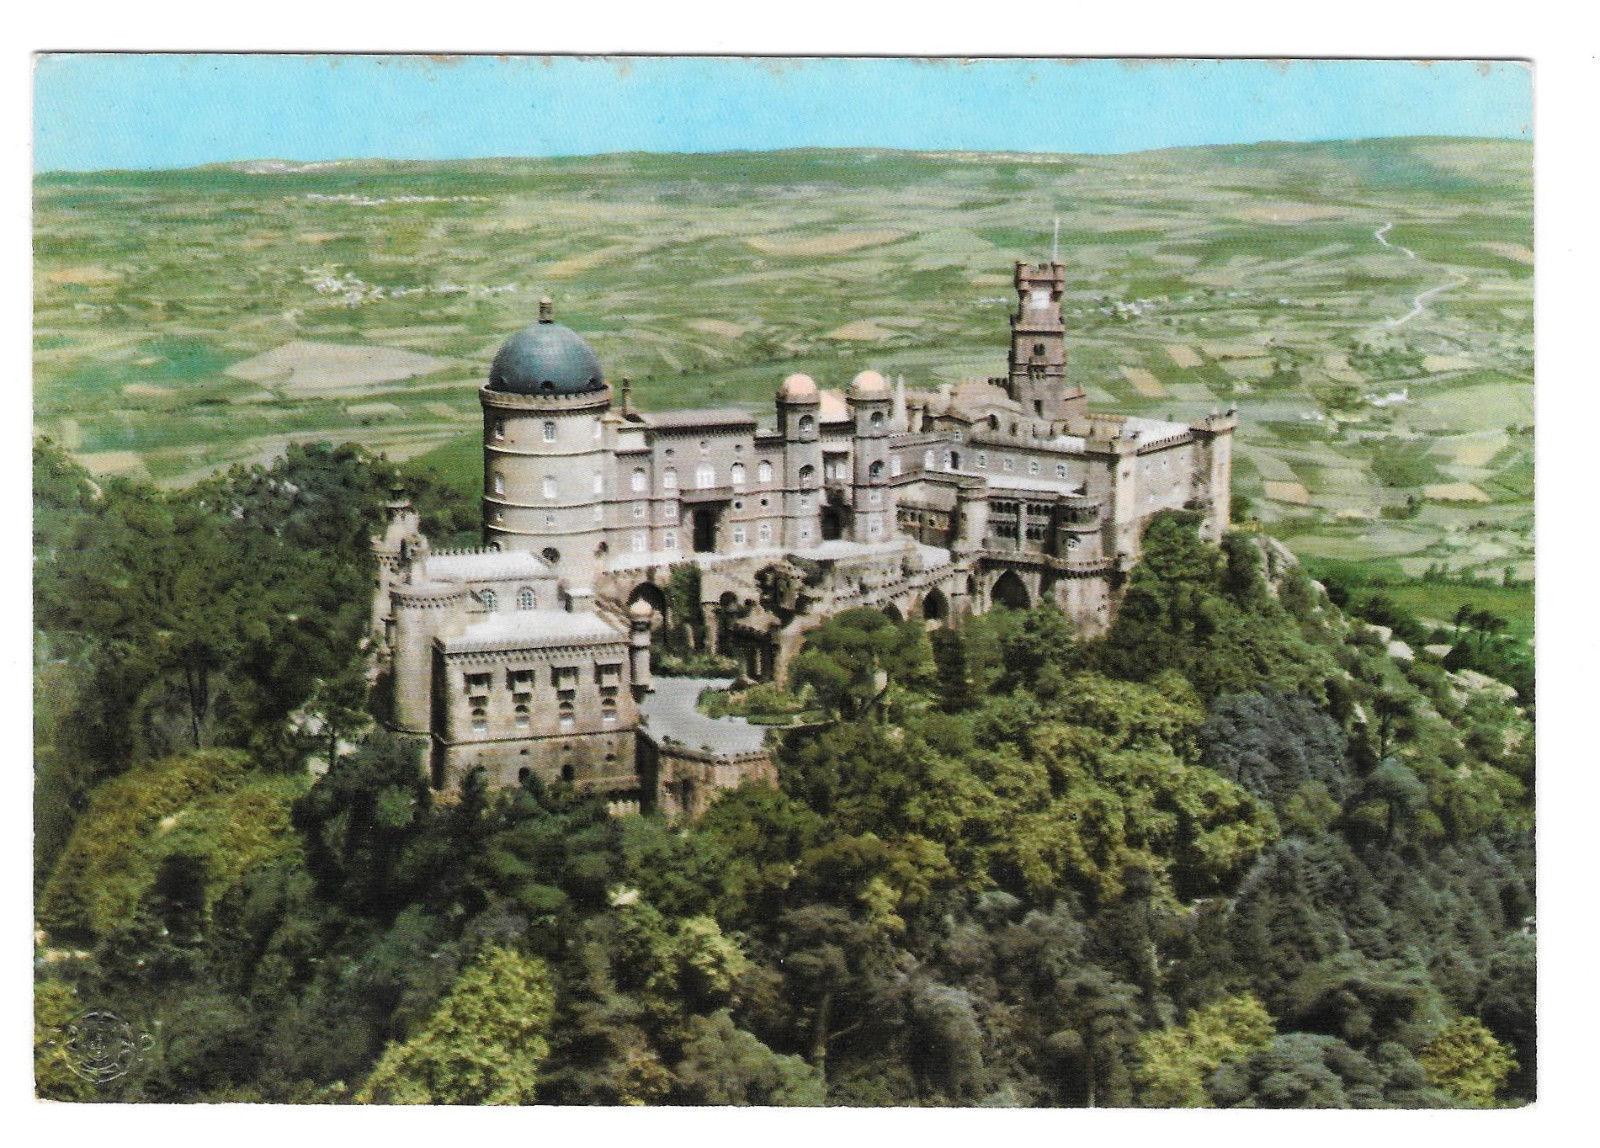 Portugal Sintra Palacio de Pena National Palace Aerial View Vtg Postcard 4X6